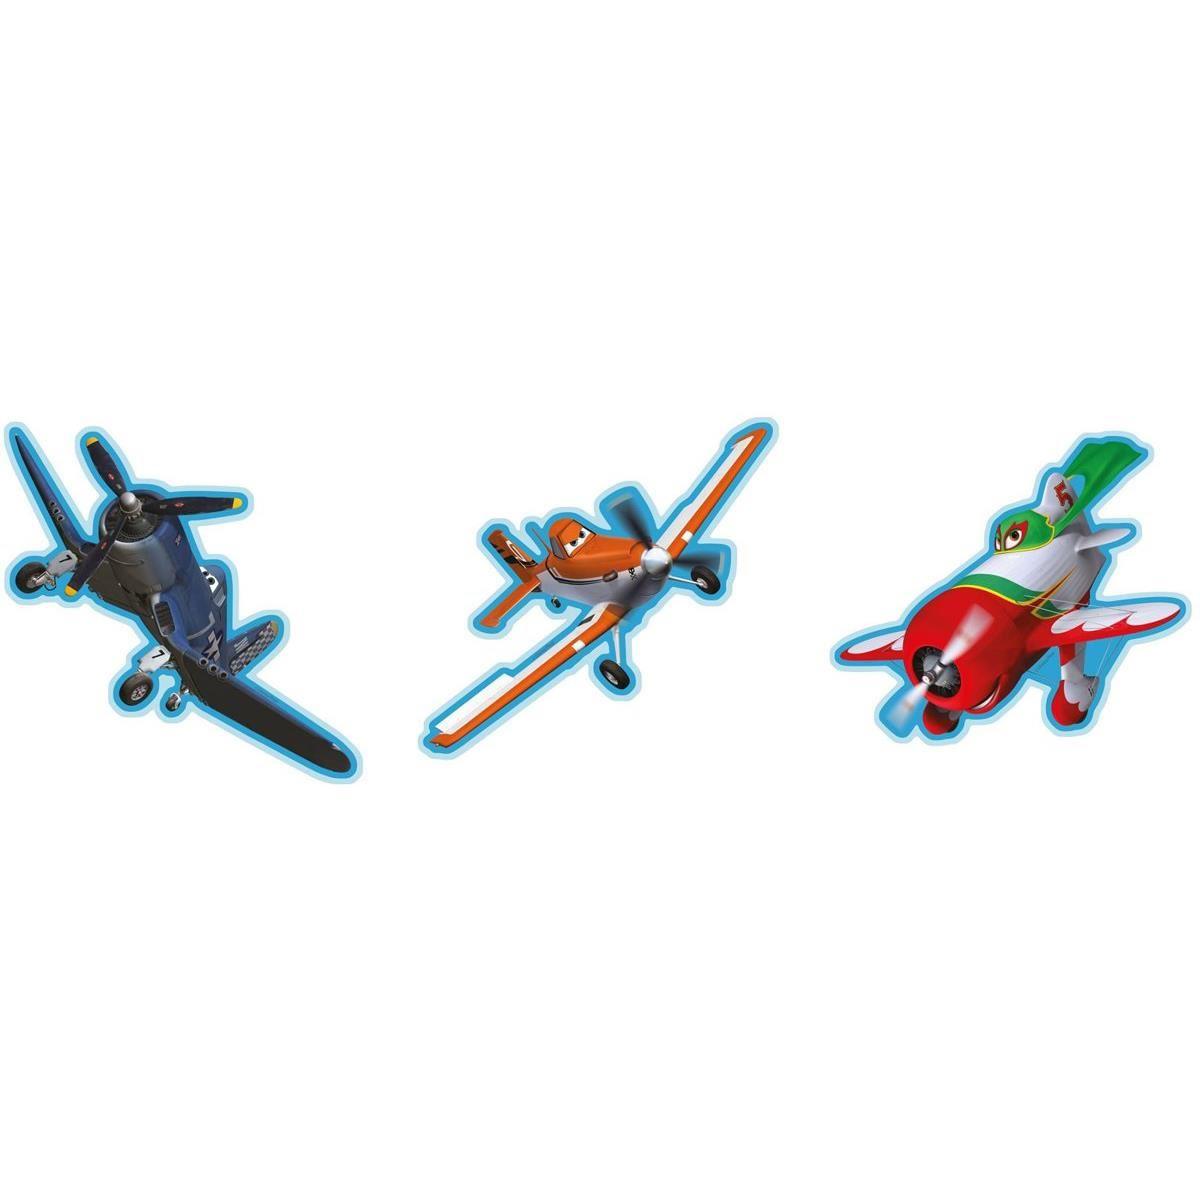 Disney Planes 3 Piece Card Decor imagine